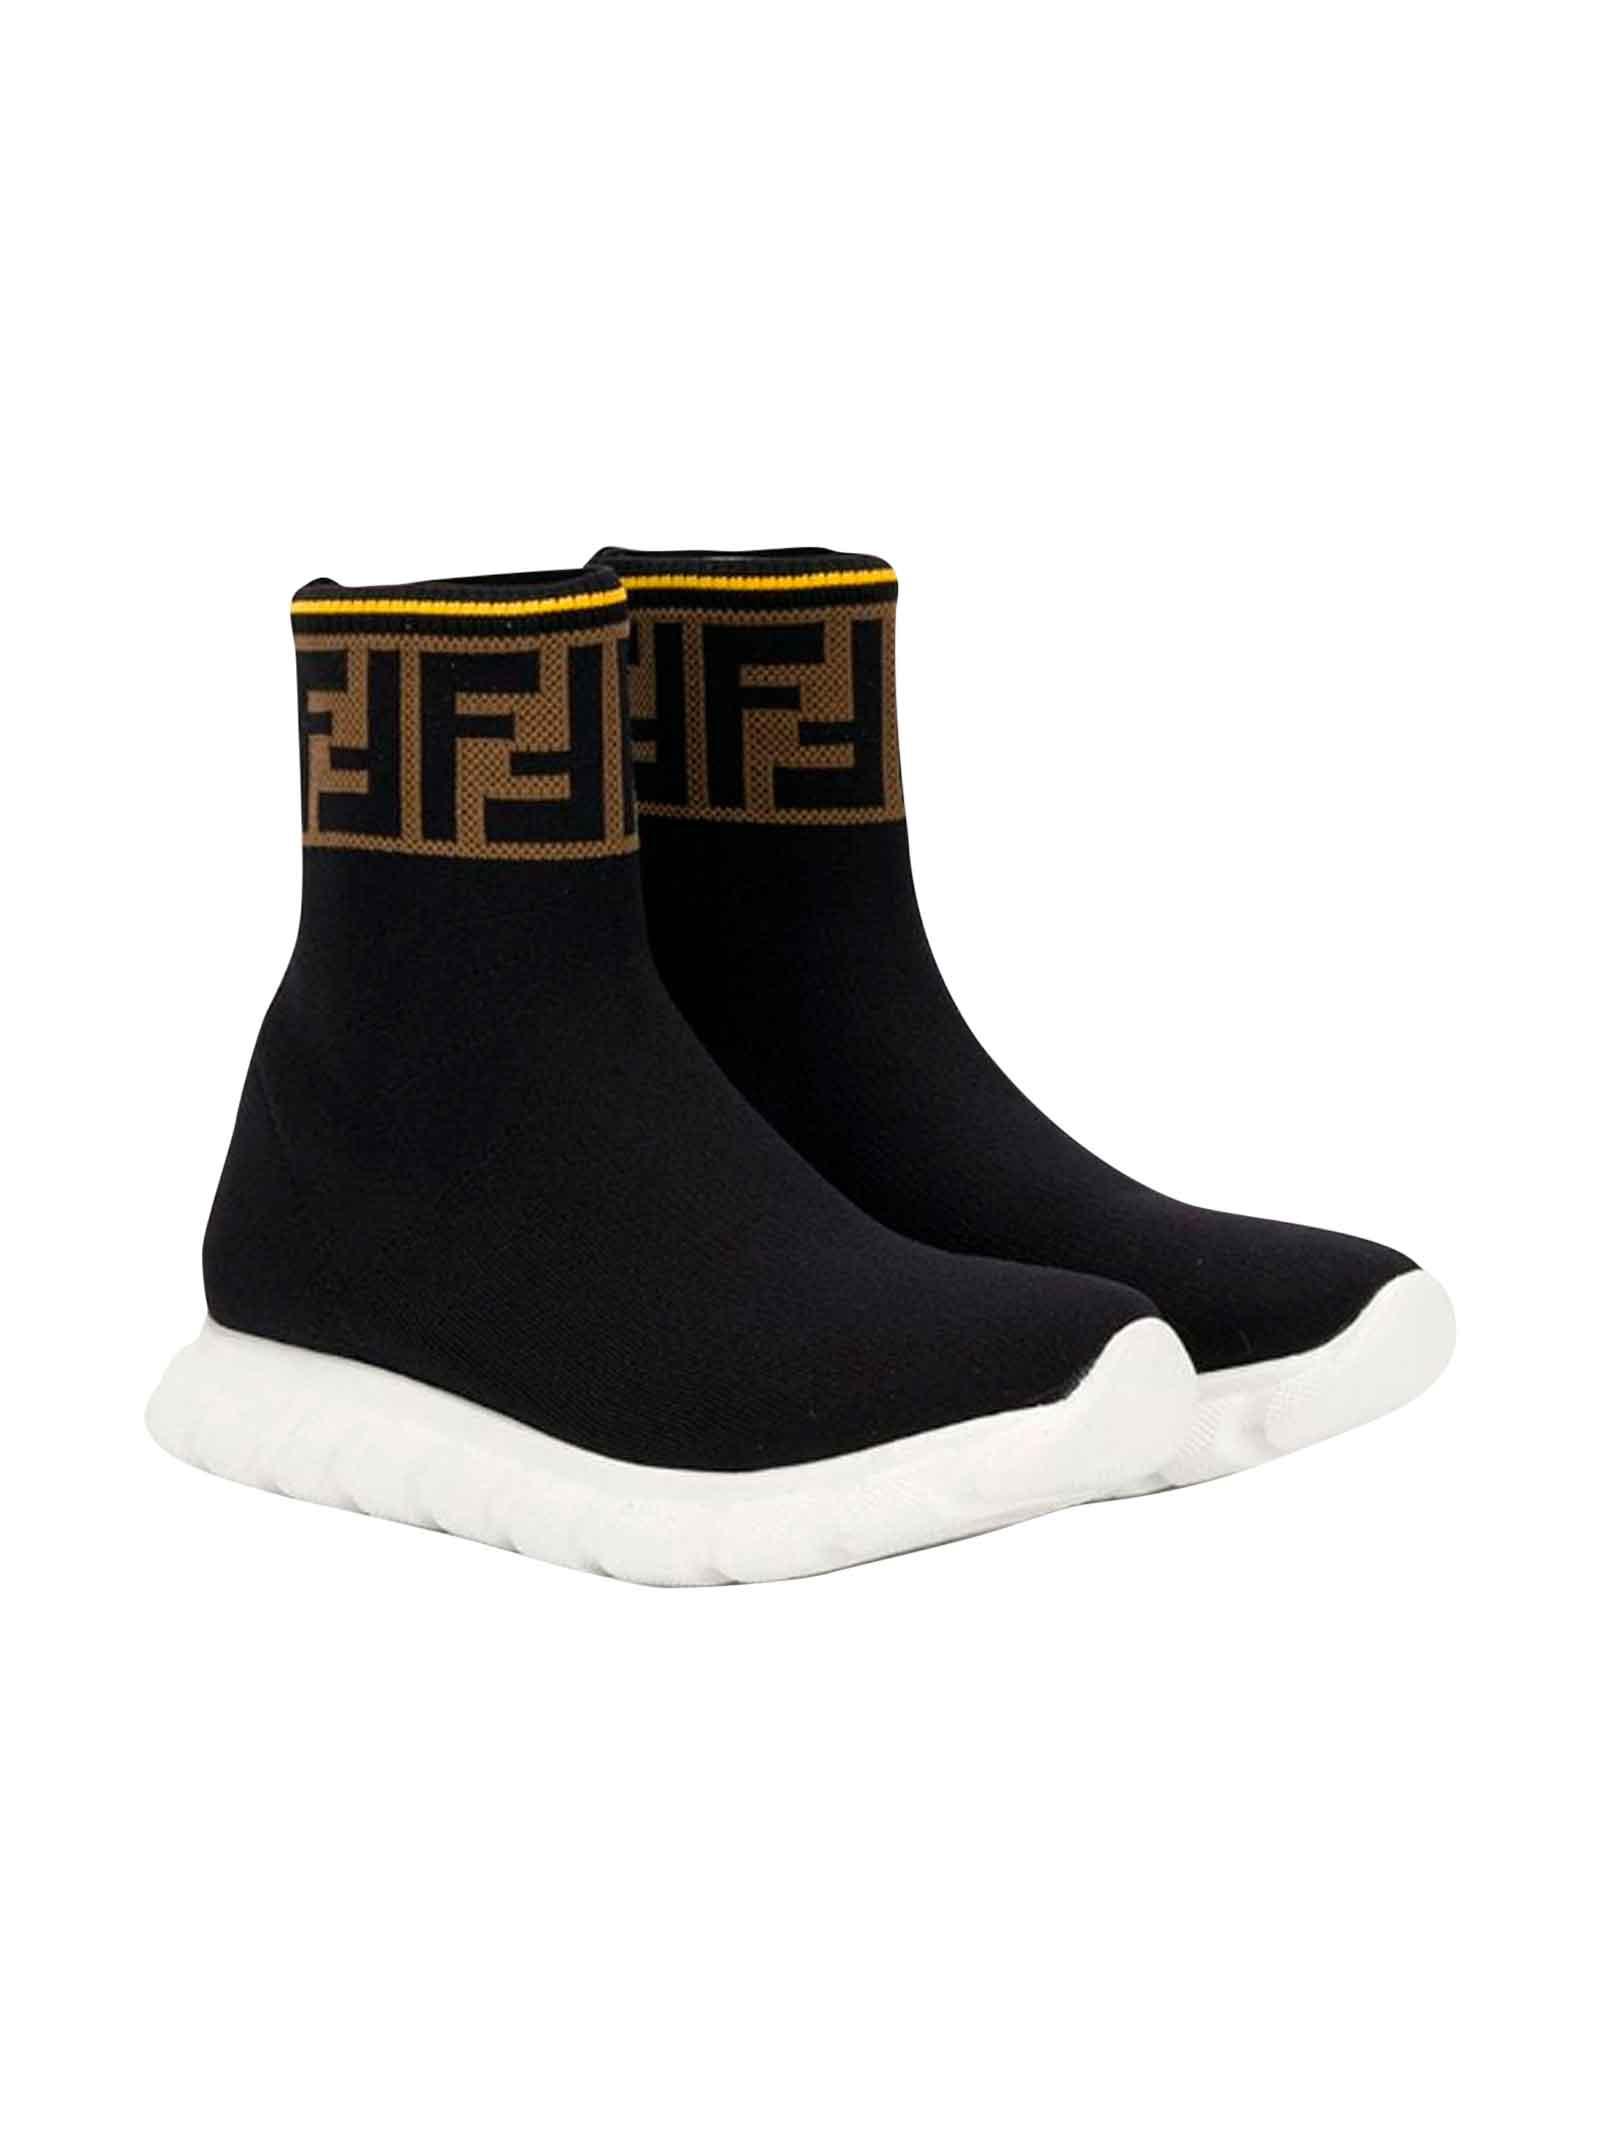 Fendi Shoes | italist, ALWAYS LIKE A SALE